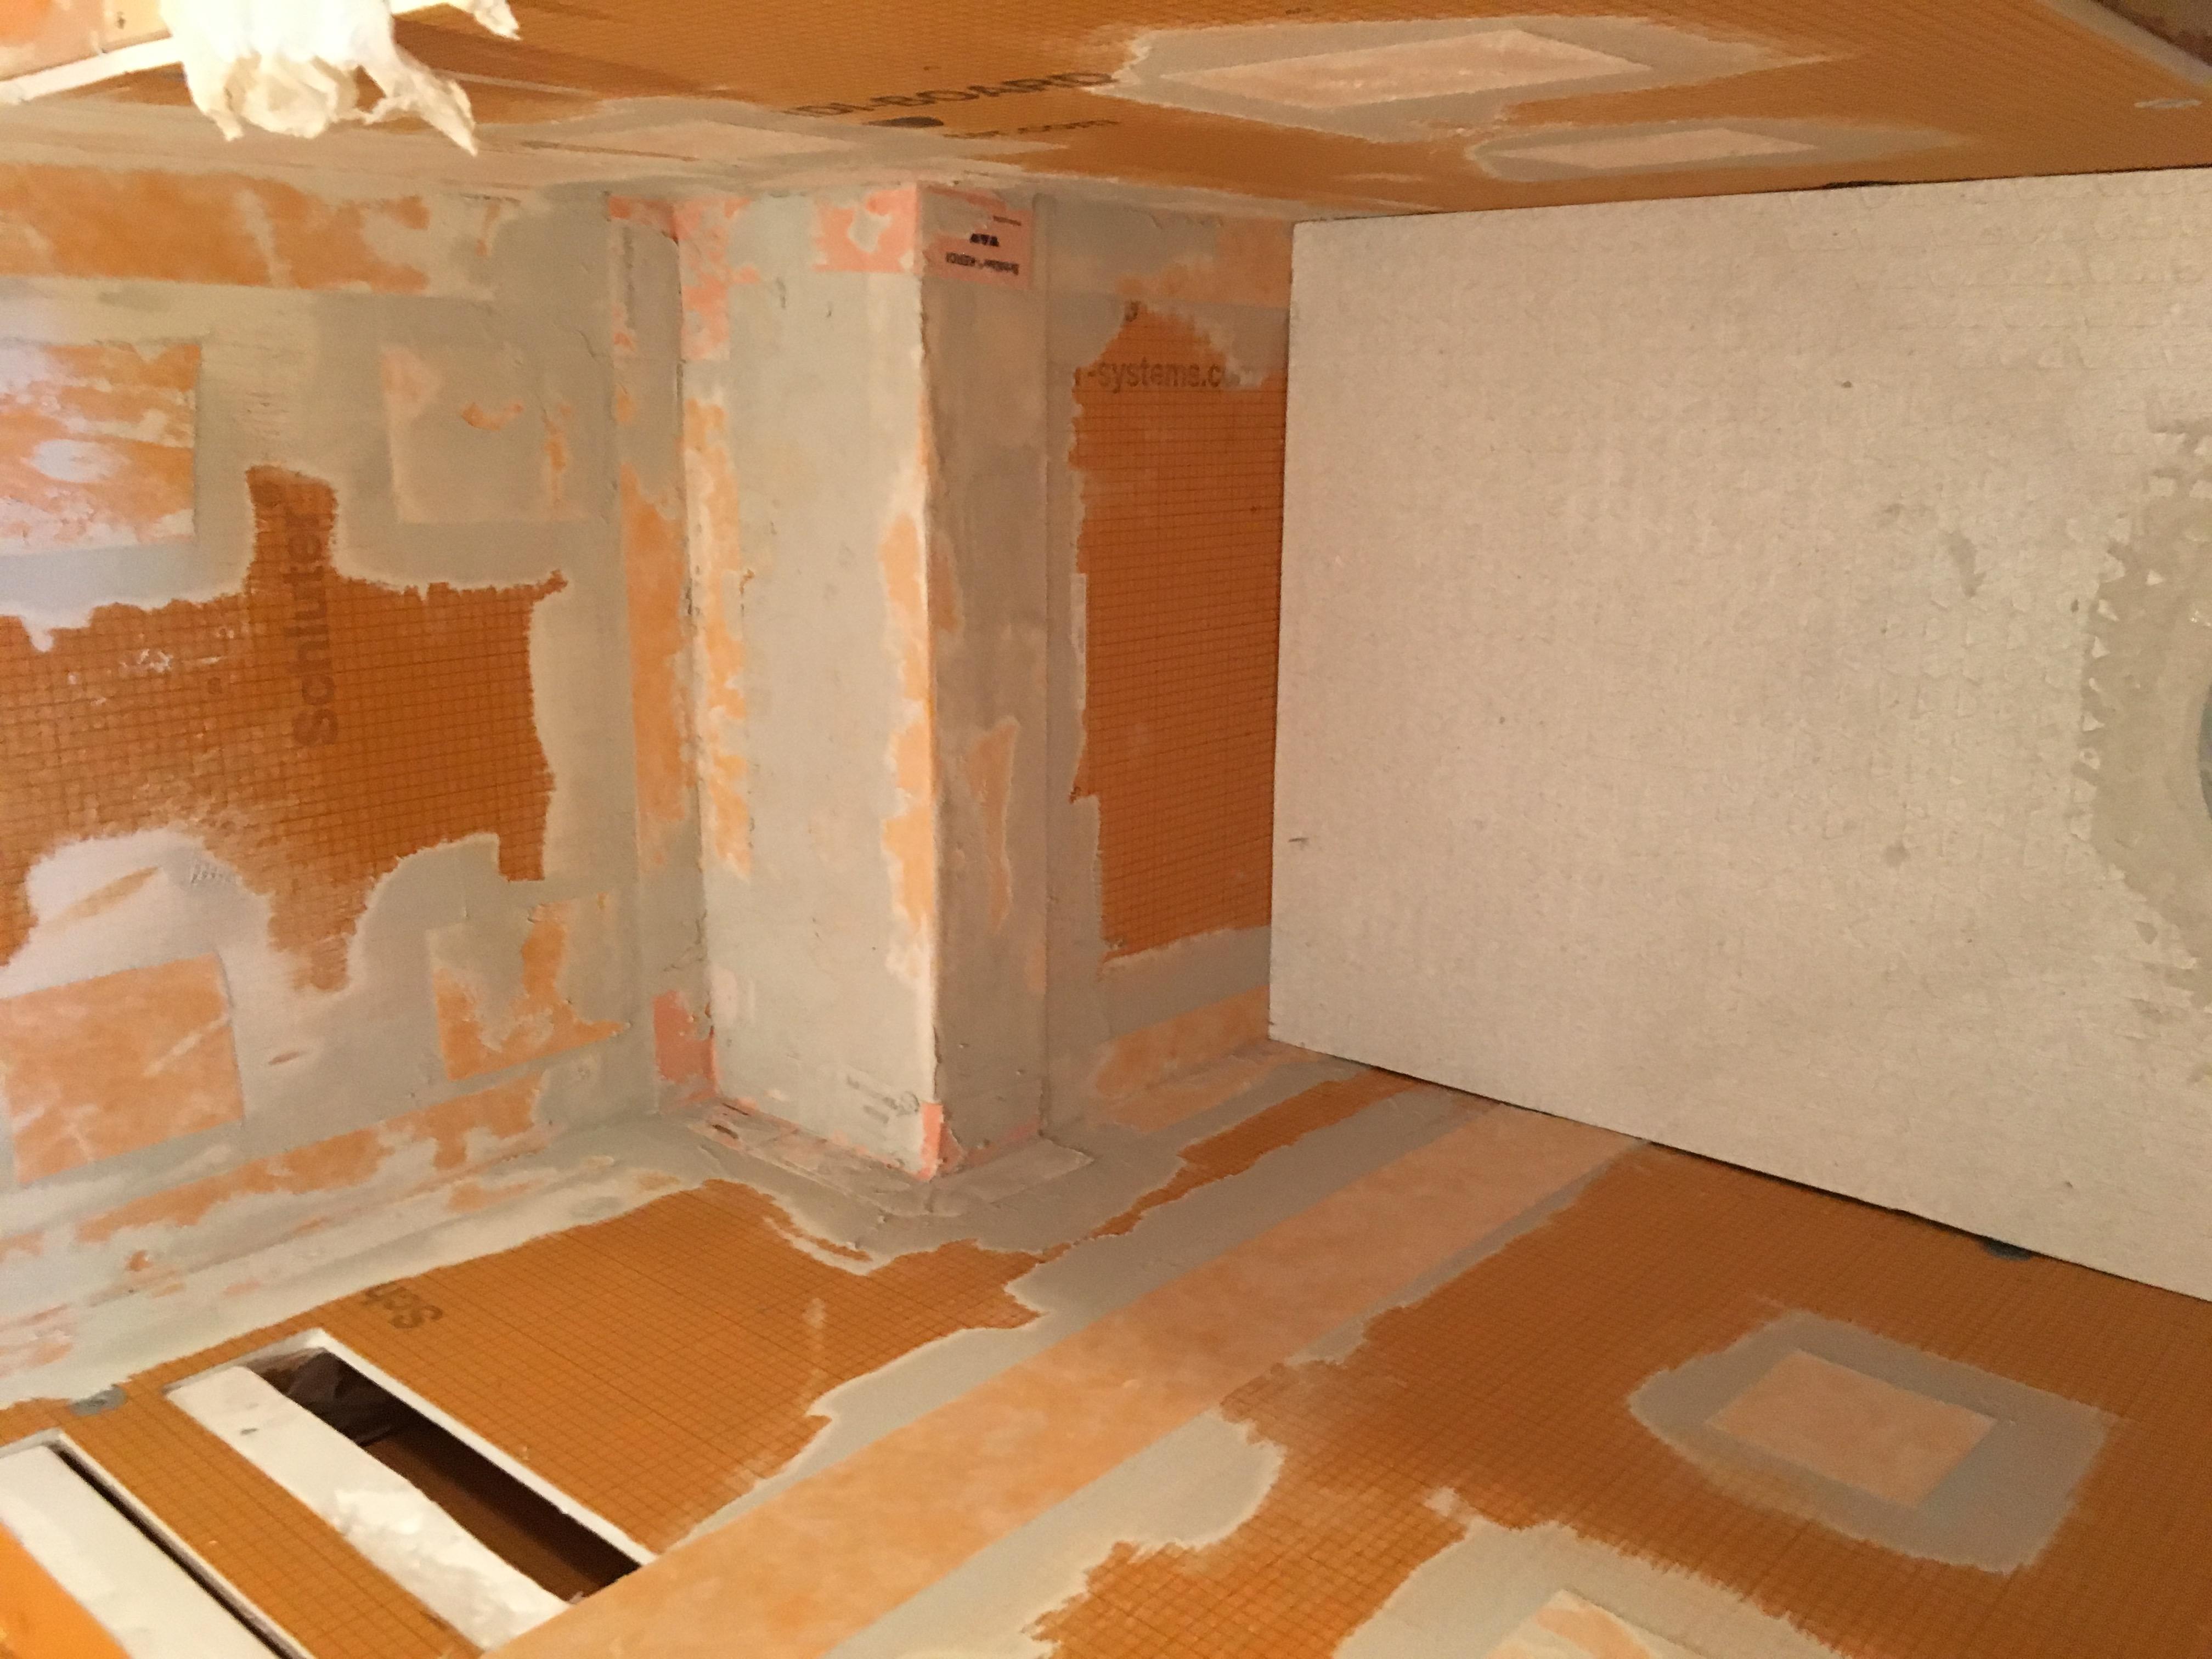 Cutting Kerdi Shower Pan-cd35547e-bc5e-49ad-8aad-4ff47d41e879.jpeg